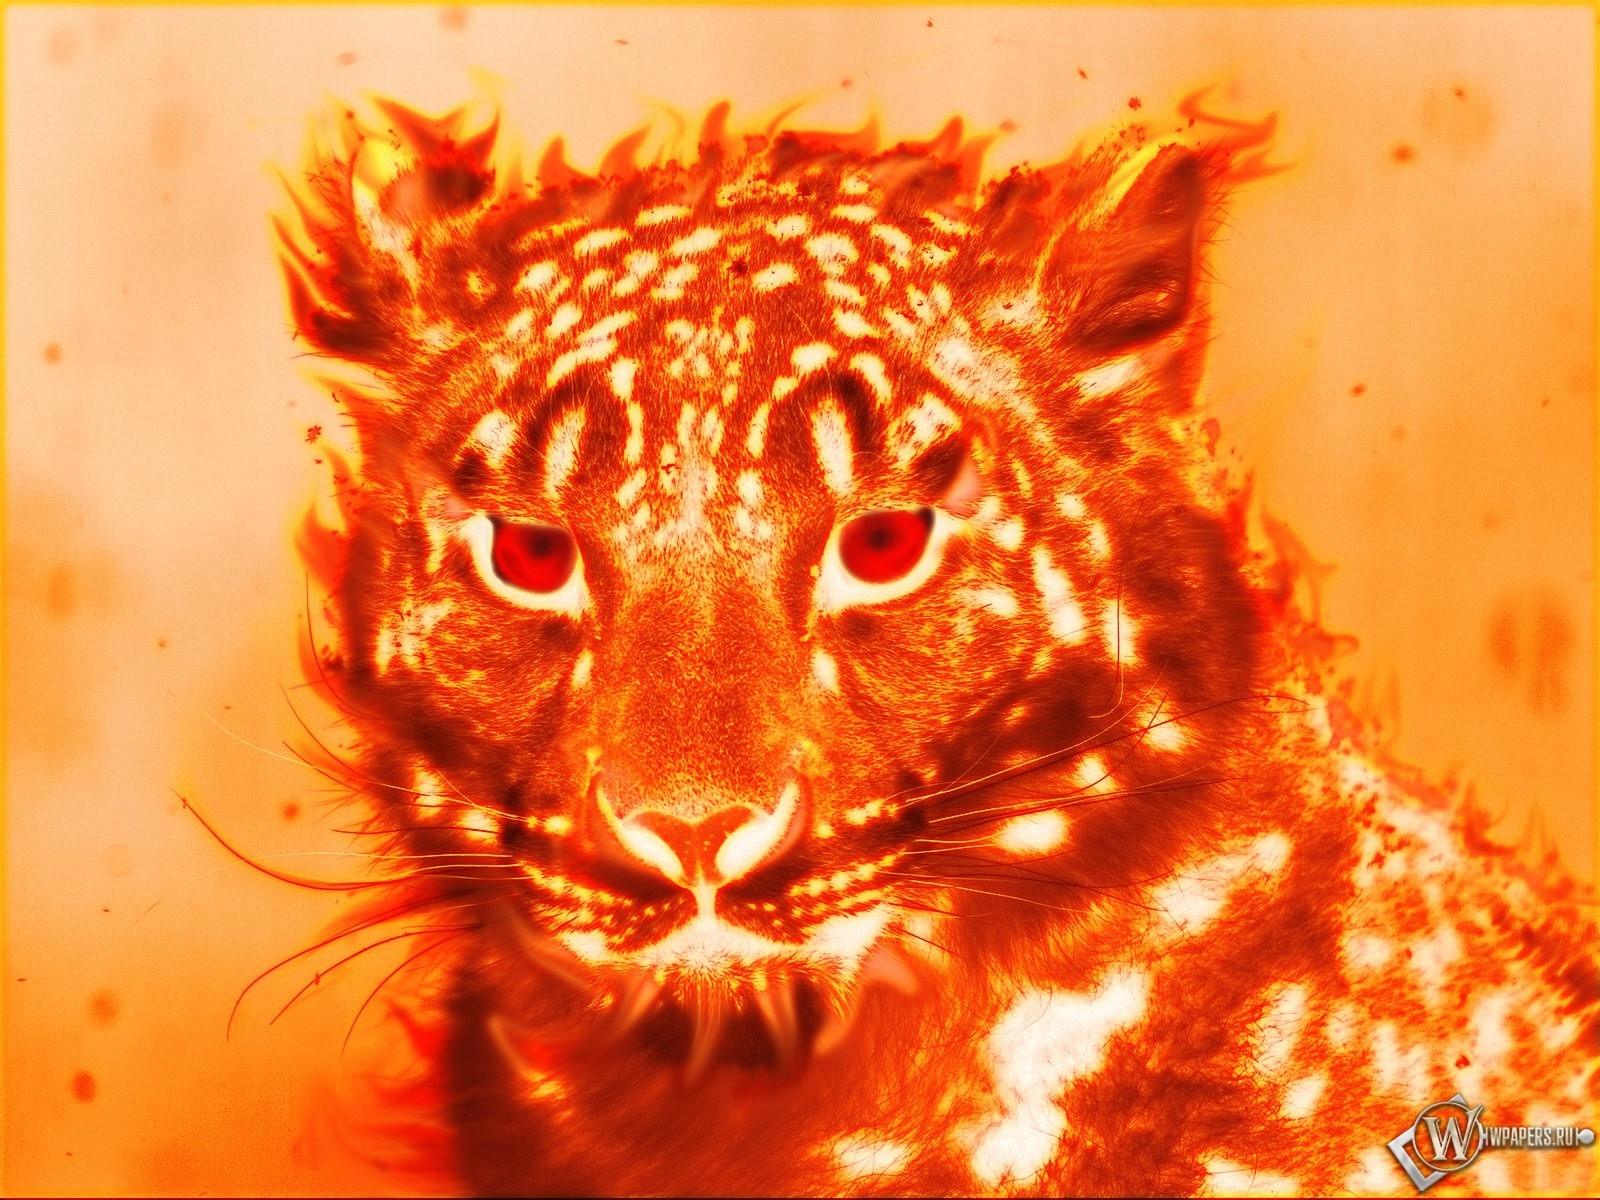 Огненный тигр 1600x1200